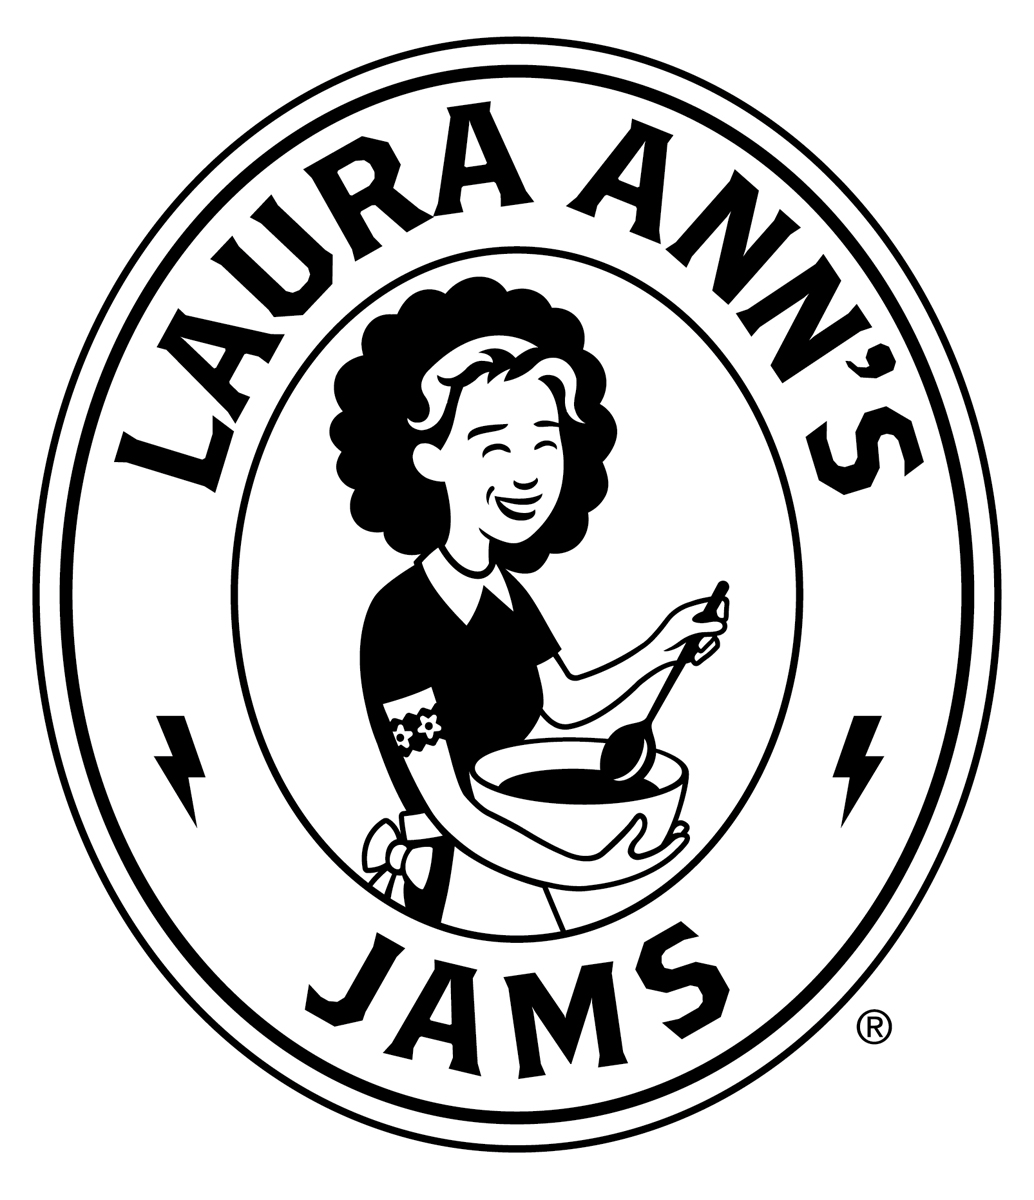 Laura Ann's Jams